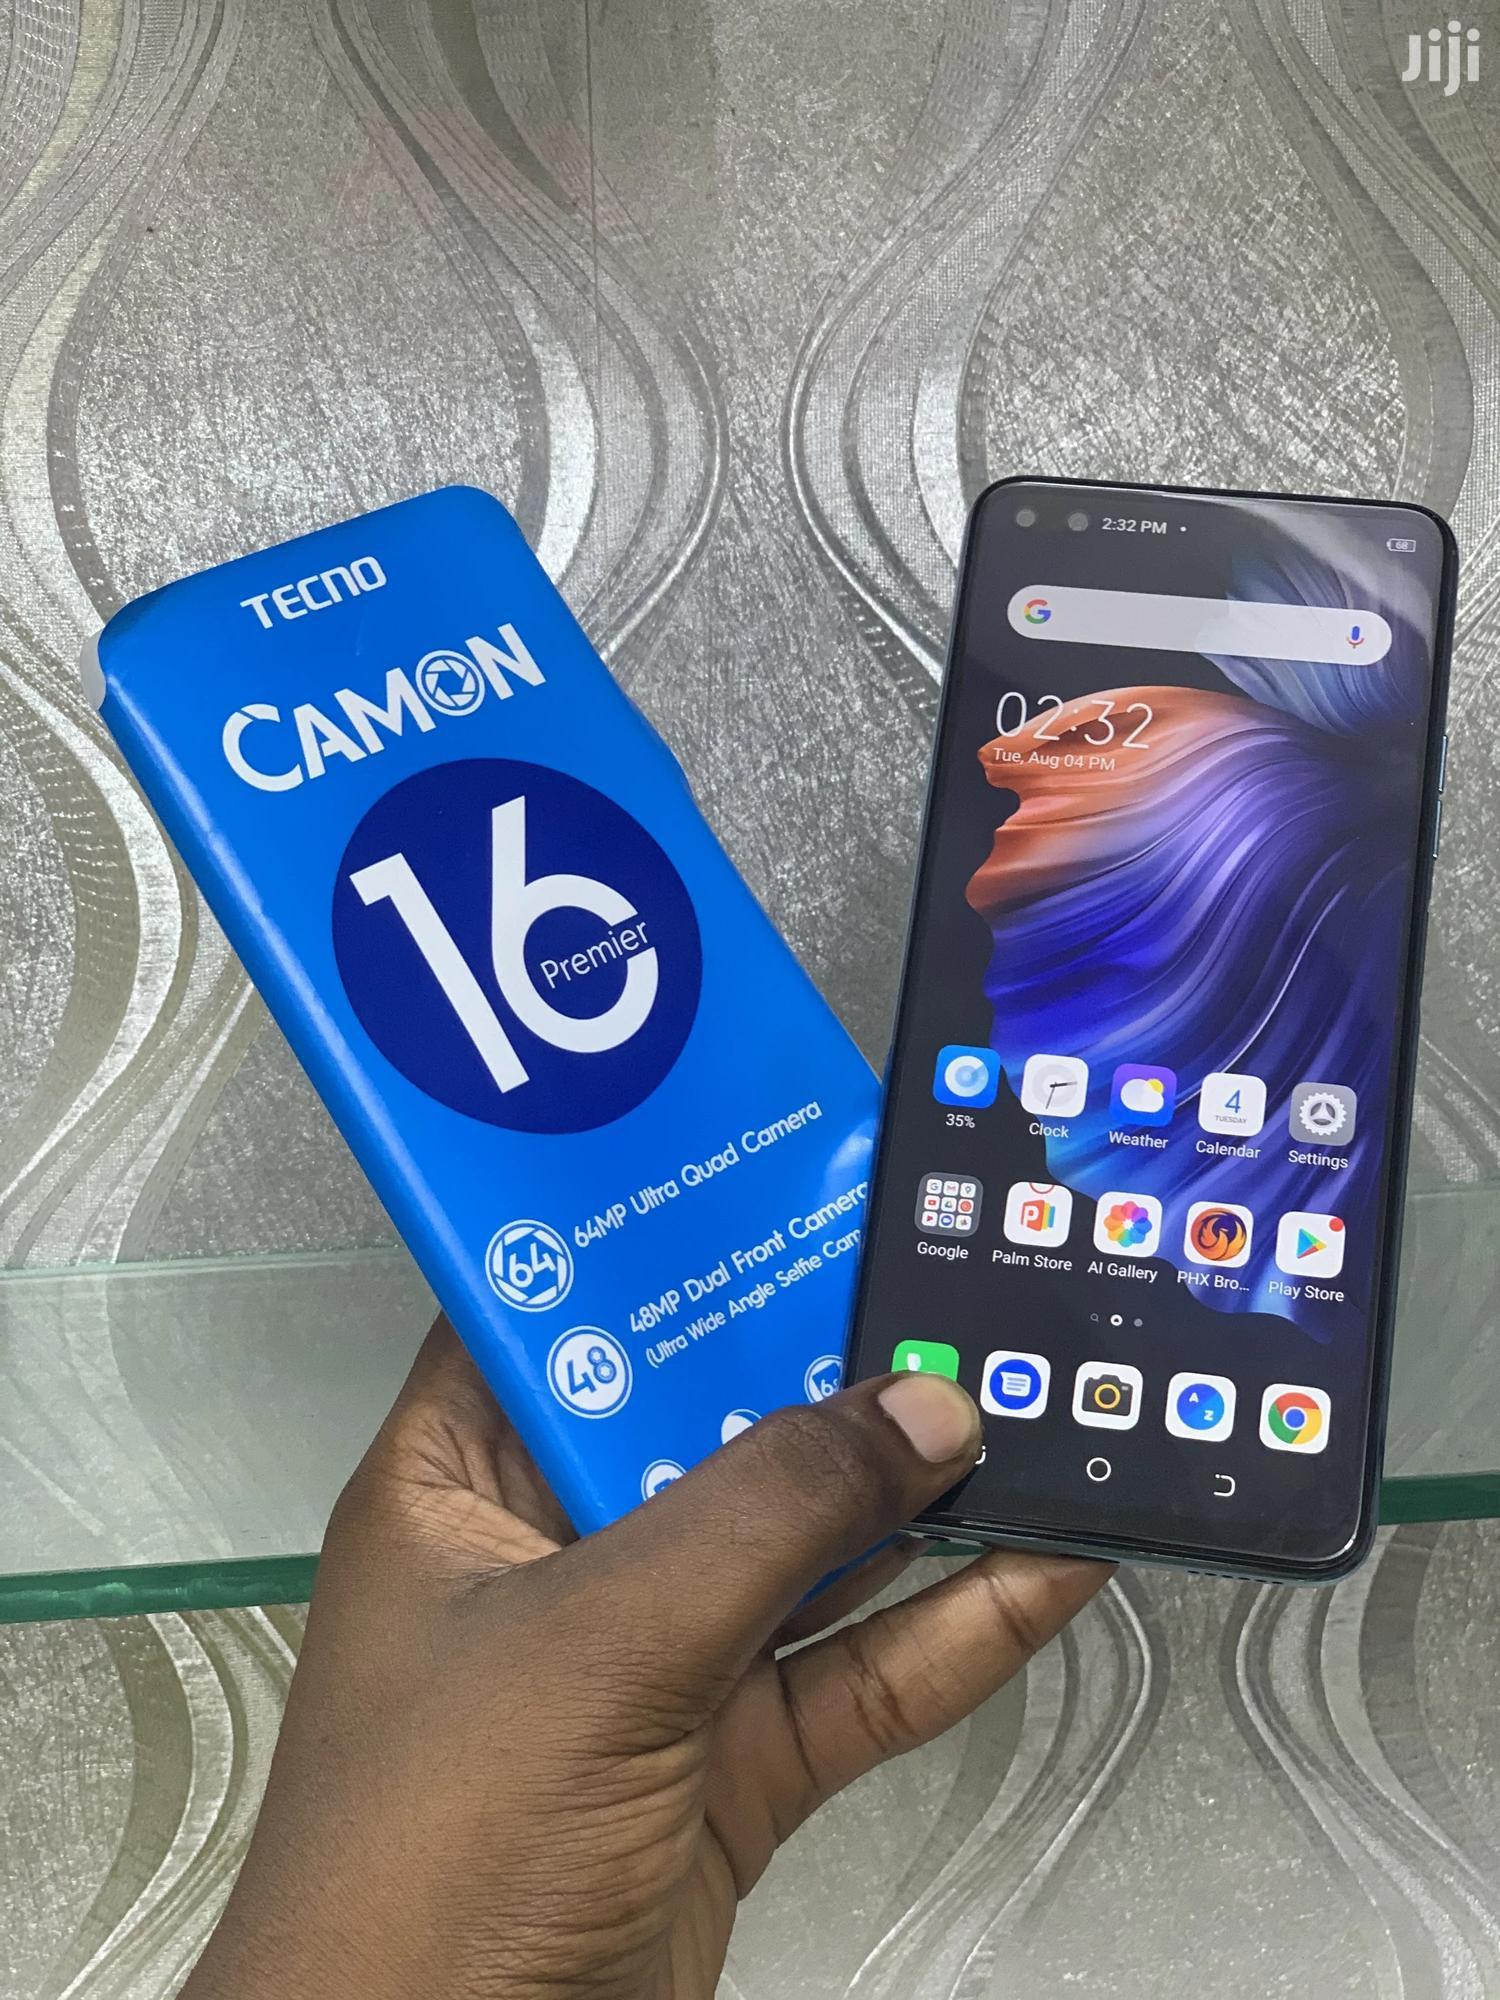 New Tecno Camon 16 Premier 128GB | Mobile Phones for sale in Ilala, Dar es Salaam, Tanzania